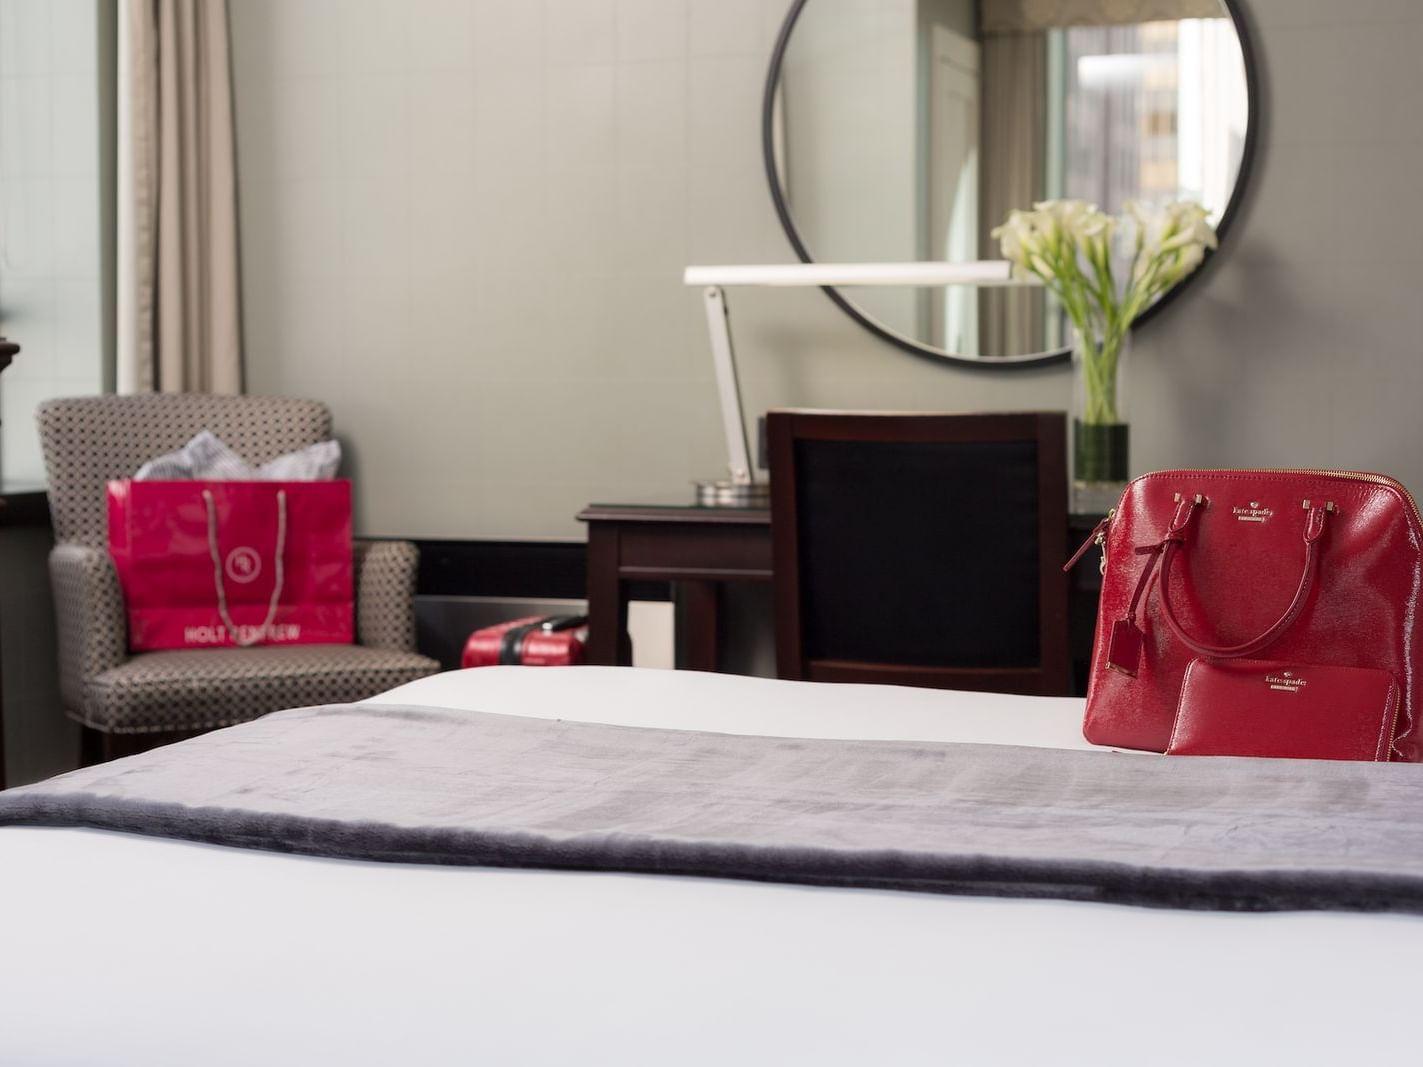 red bag on queen bed facing circular mirror